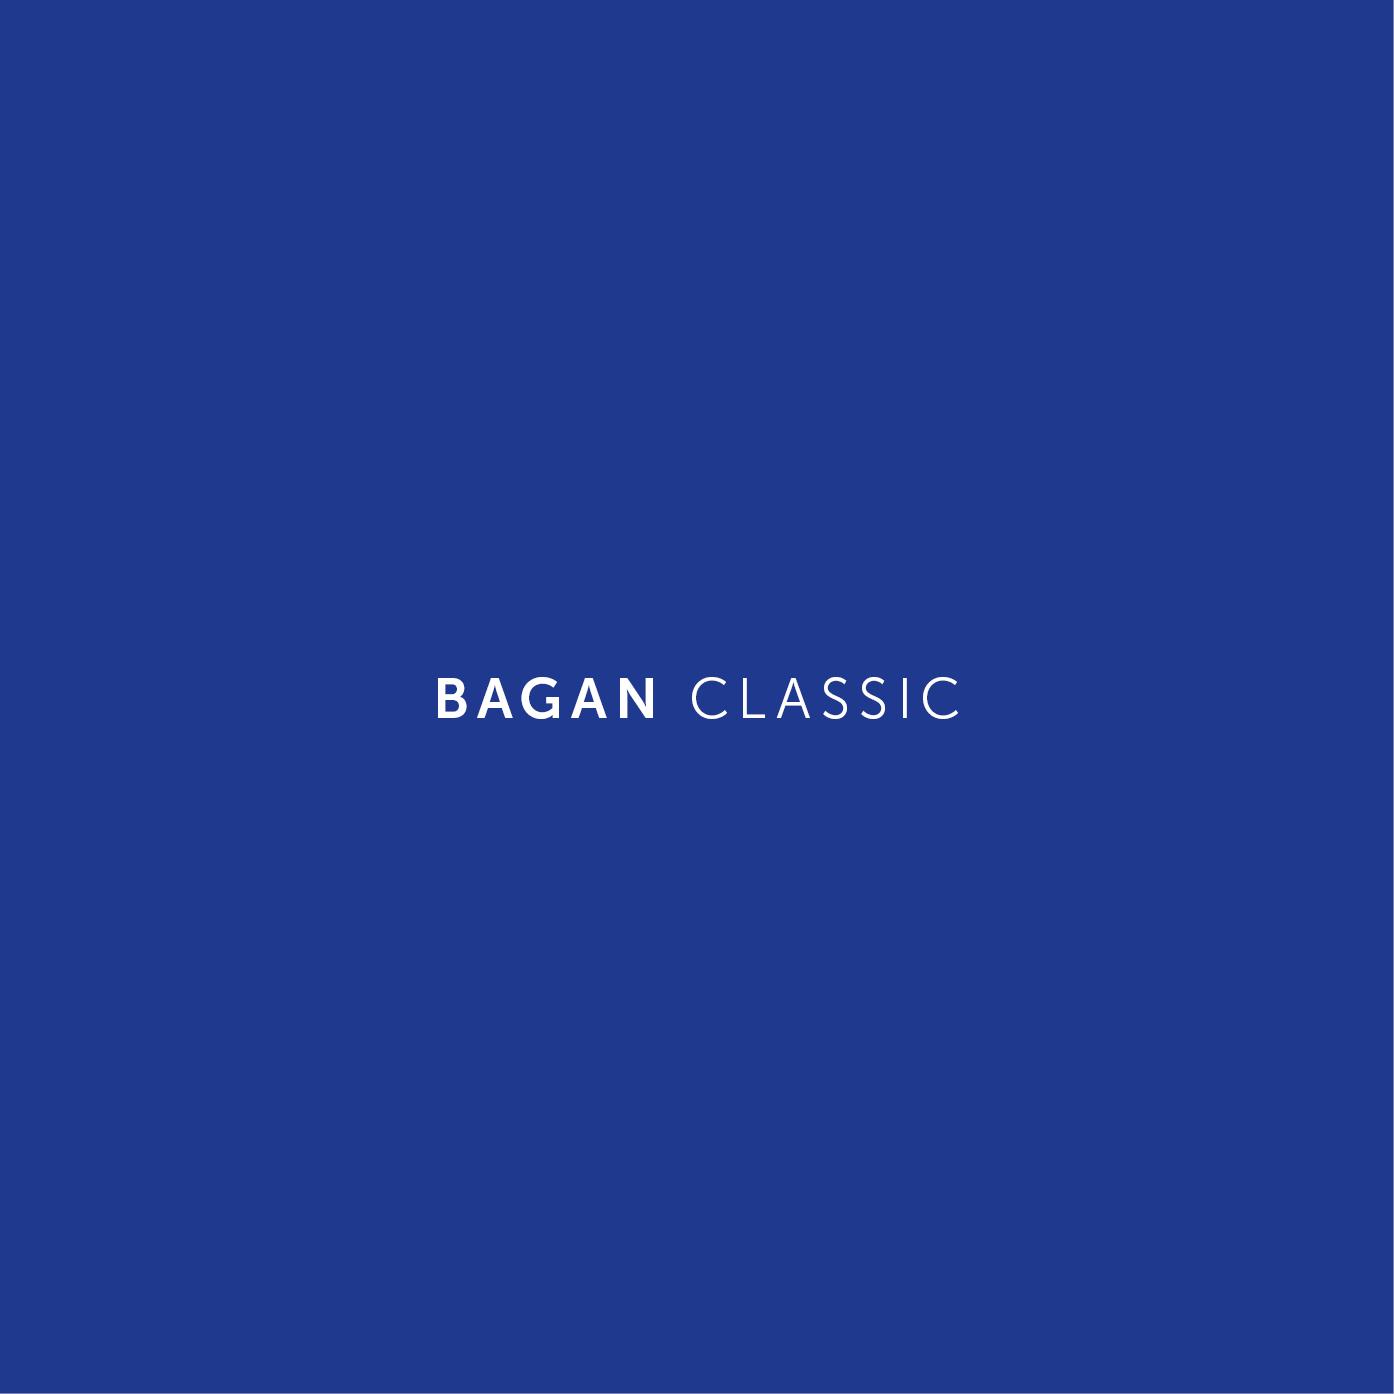 BaganClassic-Title-02.jpg